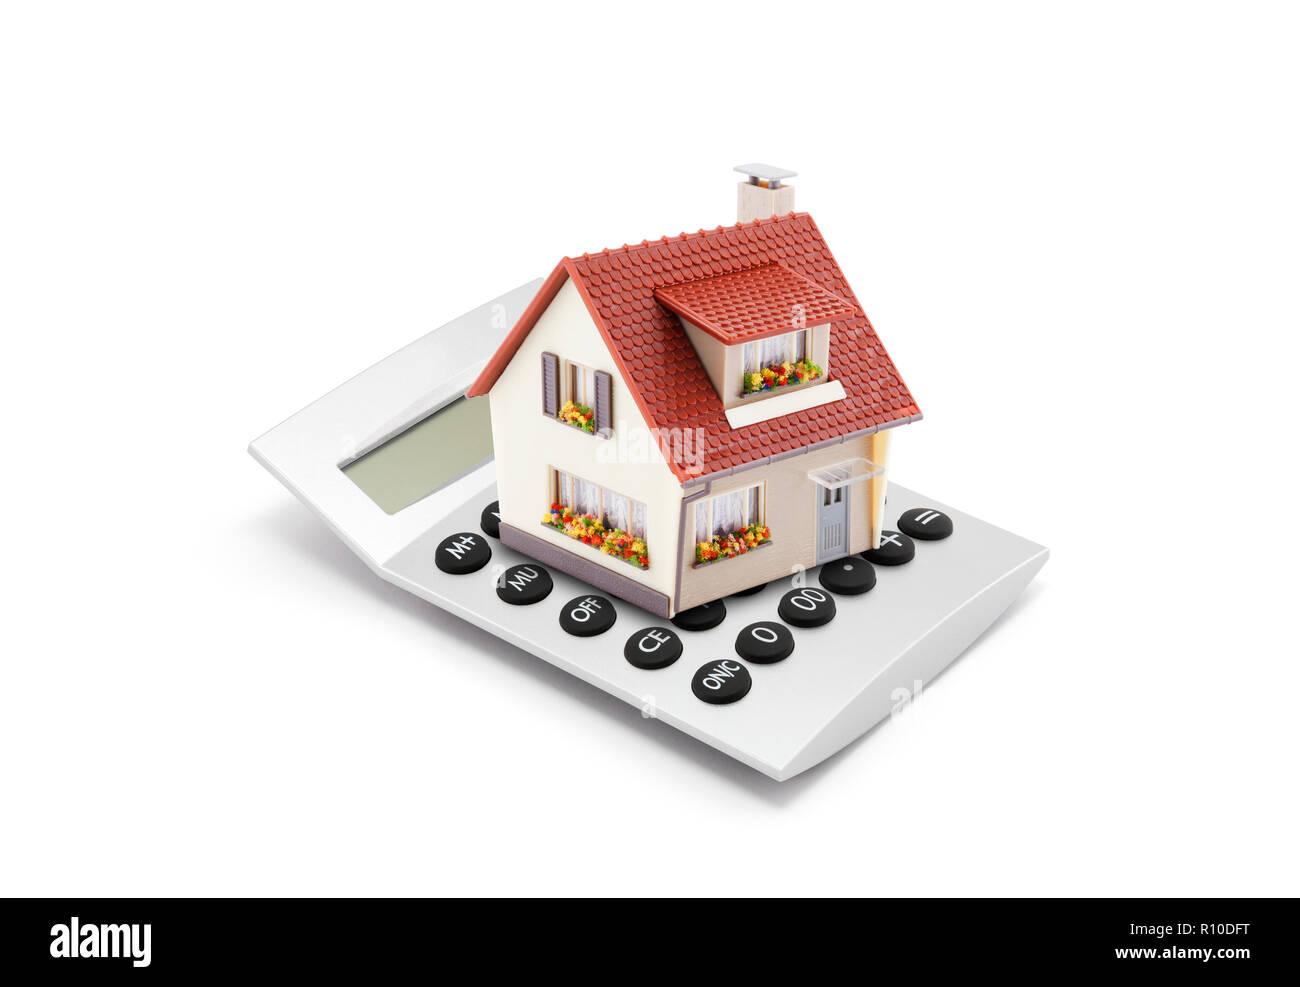 Mortgage Calculator - Stock Image